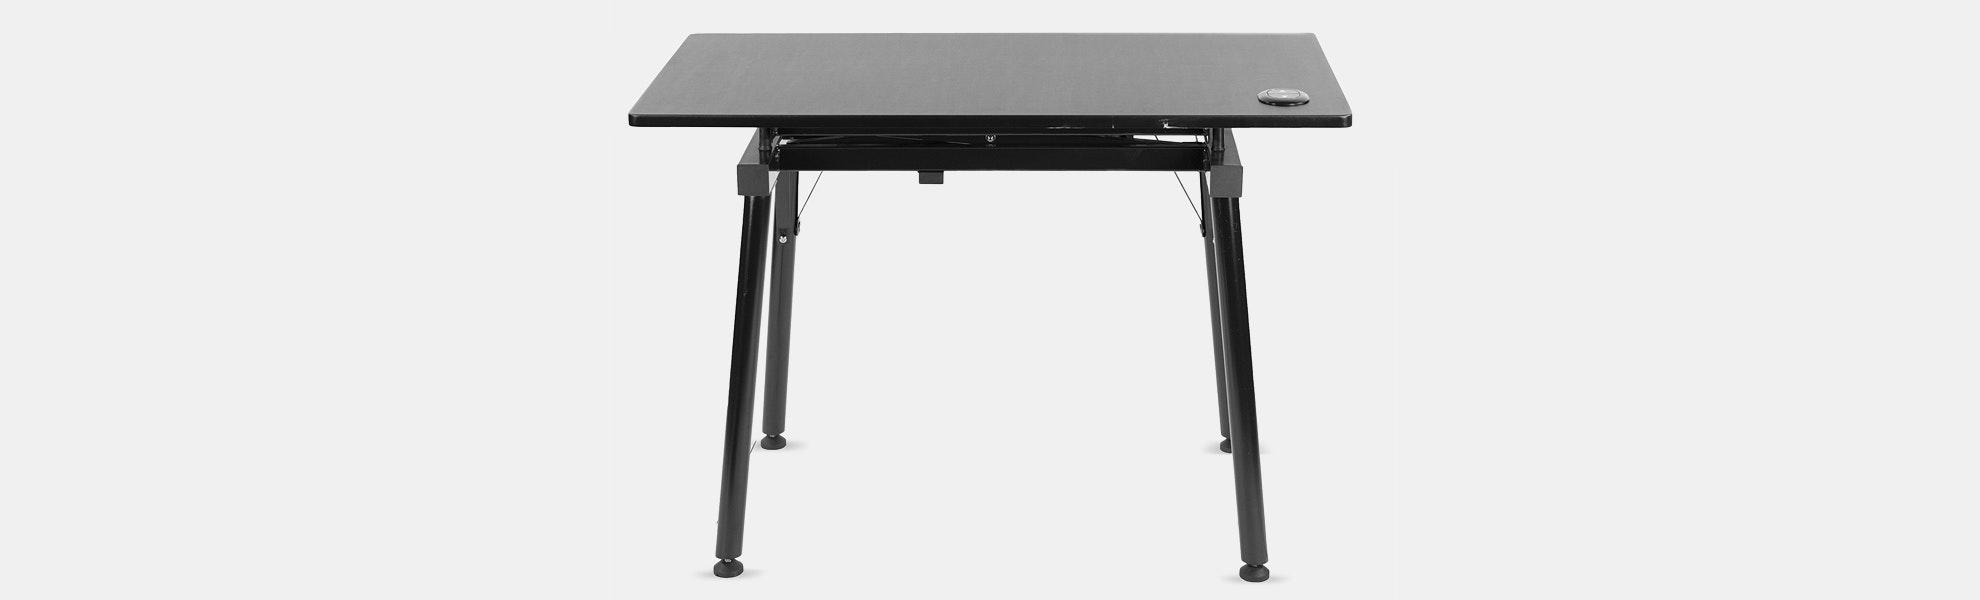 VIVO Electric Height-Adjustable Desk w/ Tabletop